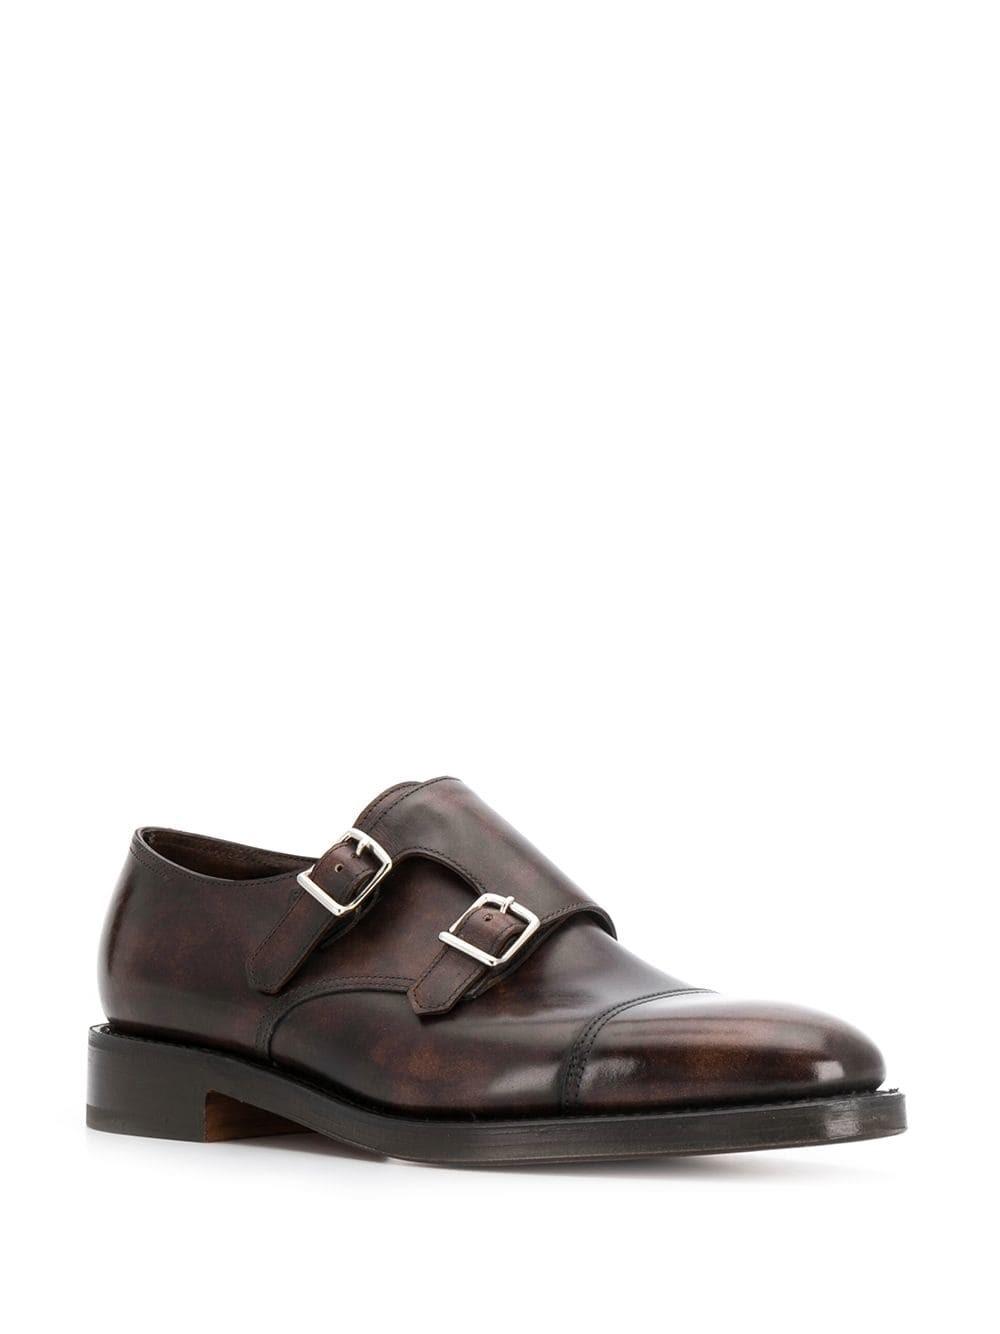 John Lobb Shoes >> William Shoes